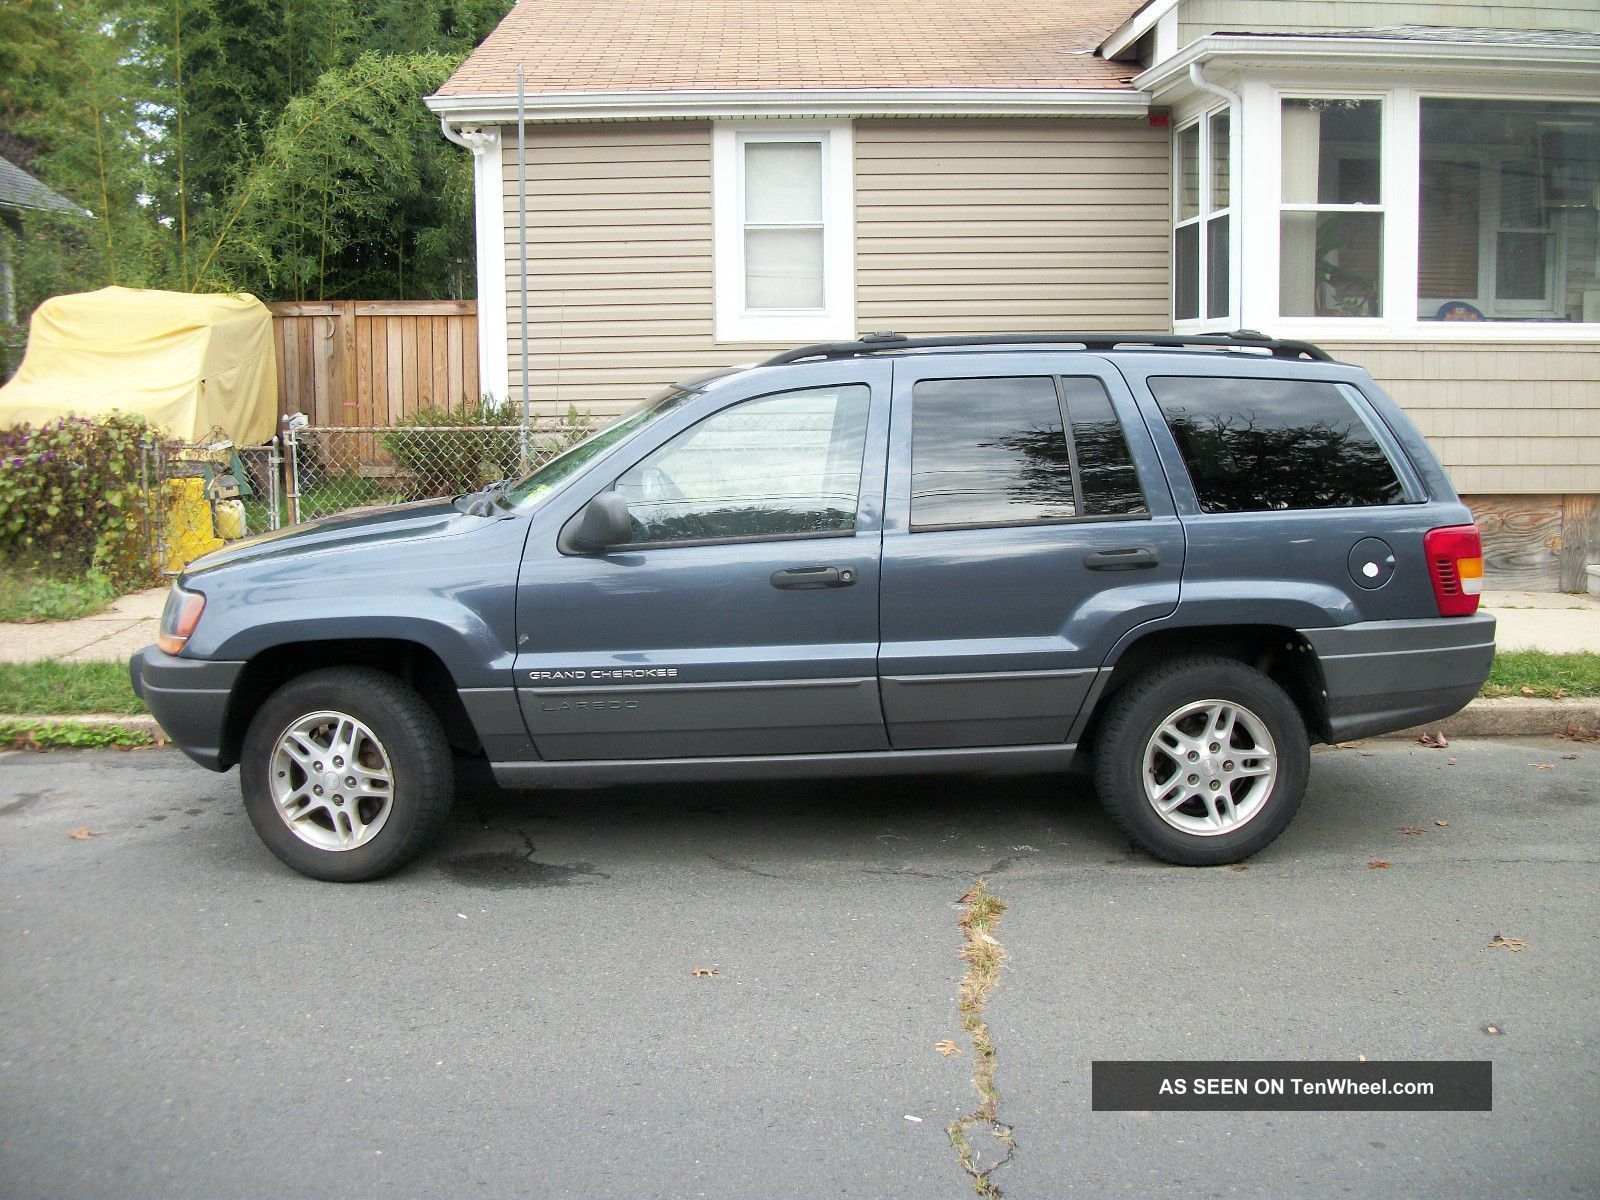 2002 jeep grand cherokee larado grand cherokee photo 1. Cars Review. Best American Auto & Cars Review